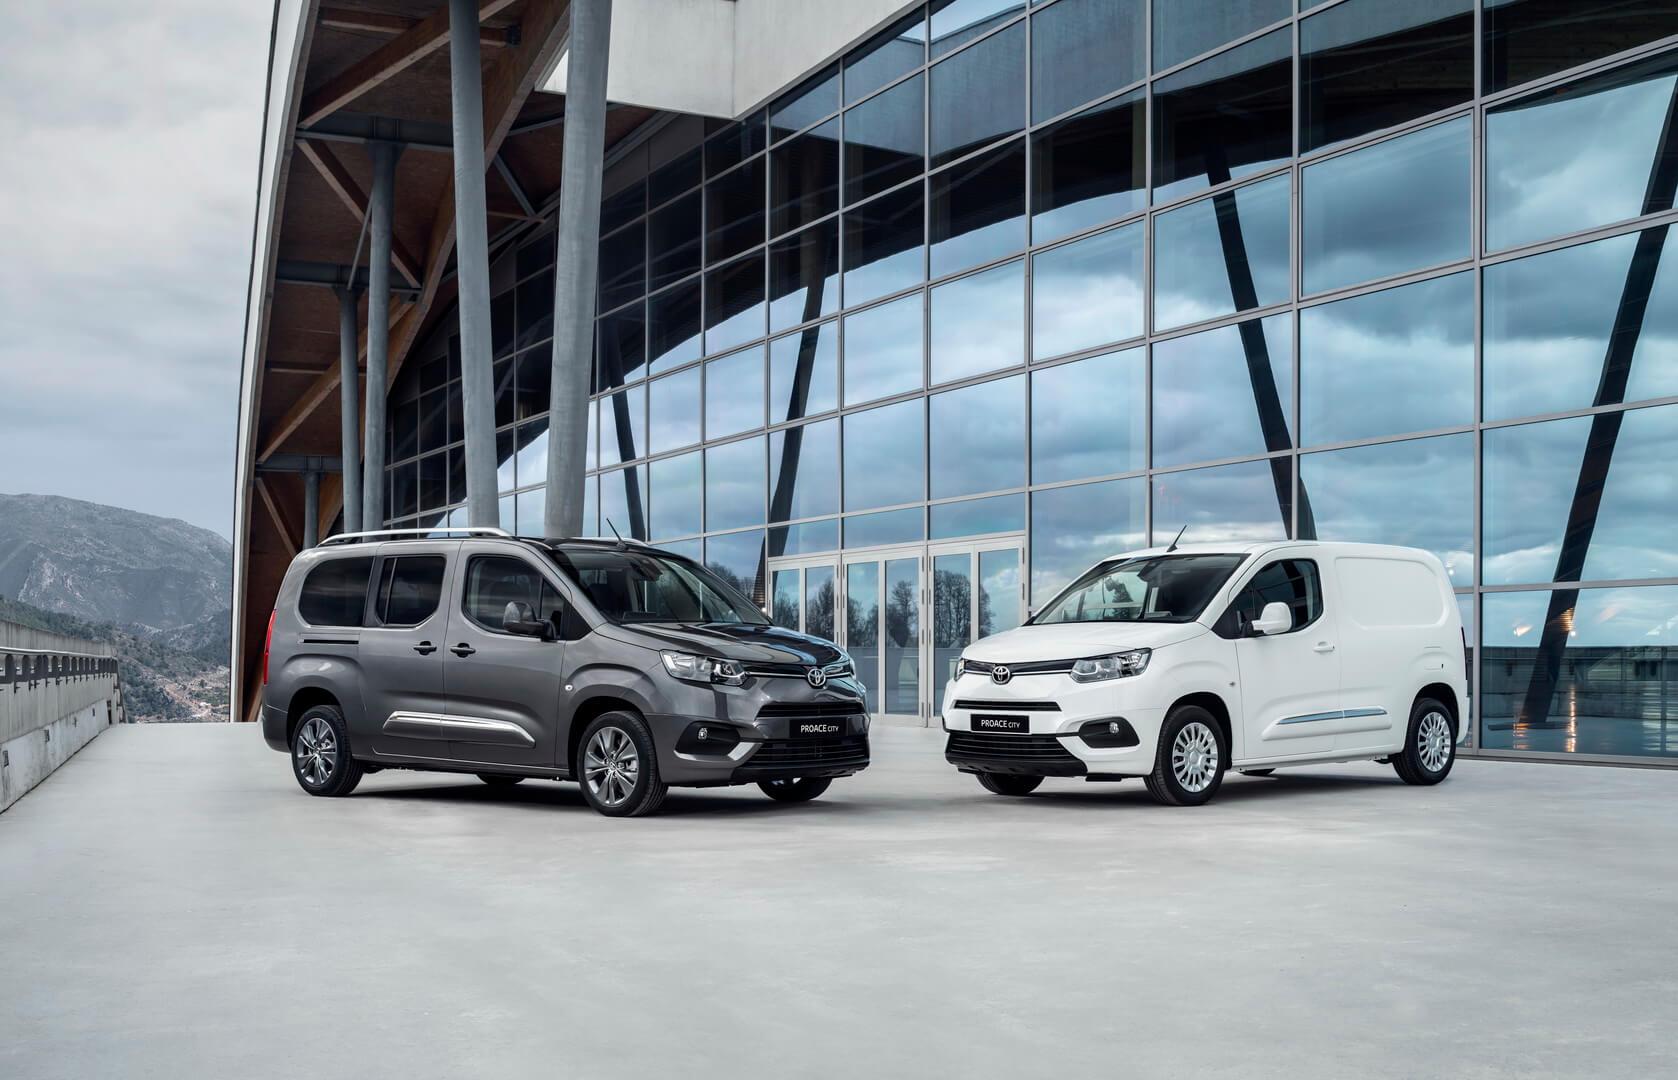 Электрические версии фургонов Toyota Proace иProace City